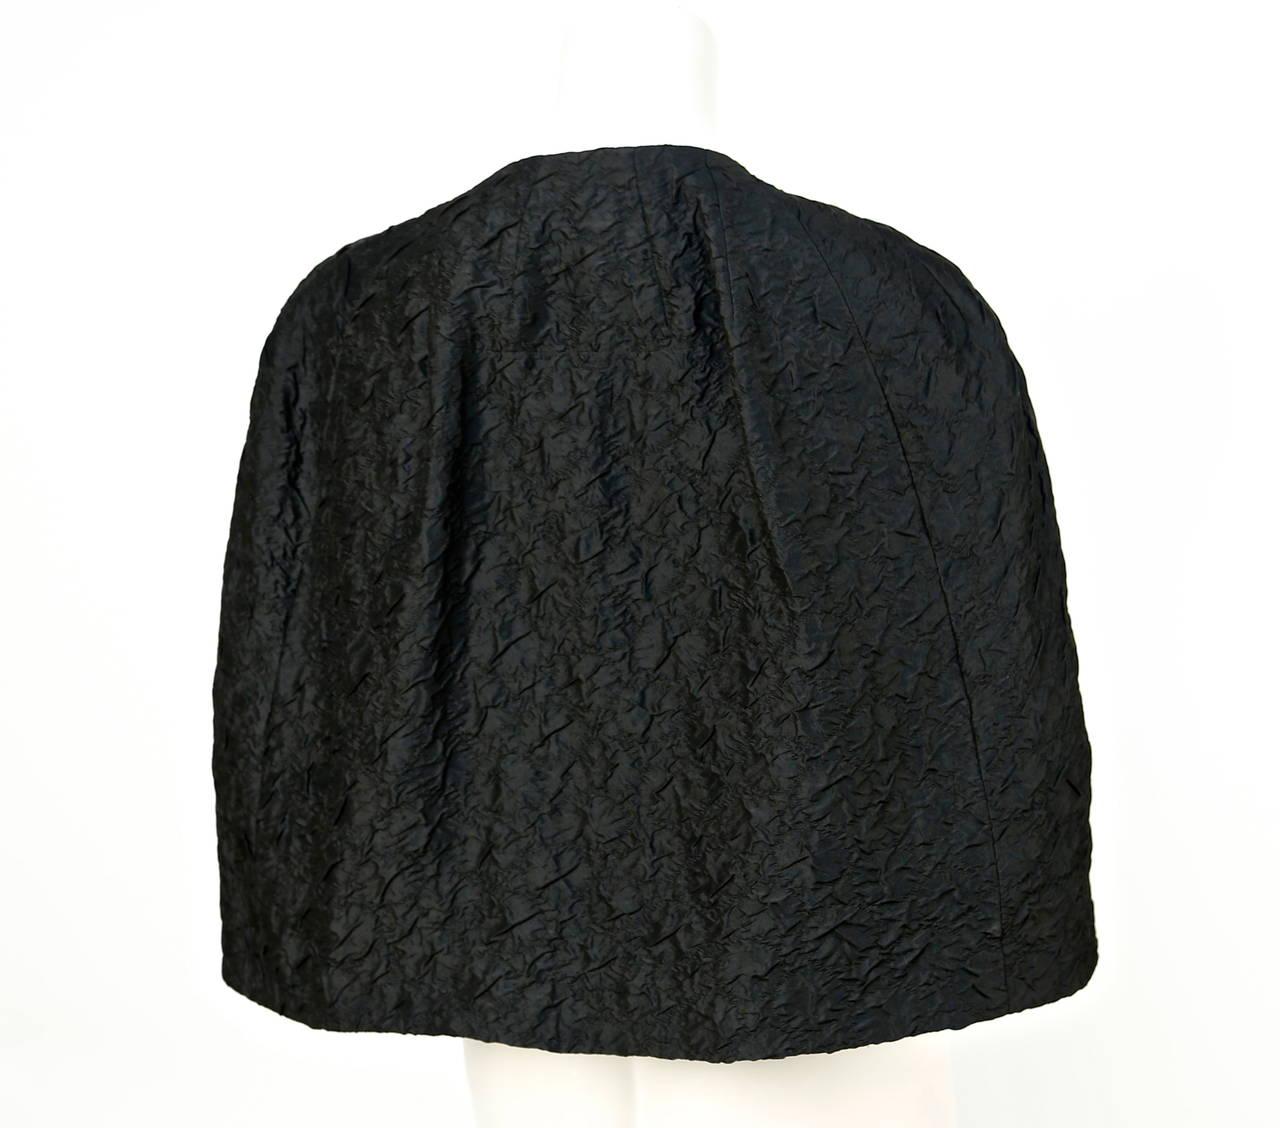 1960's CRISTOBAL BALENCIAGA EISA haute couture black silk capelet 4